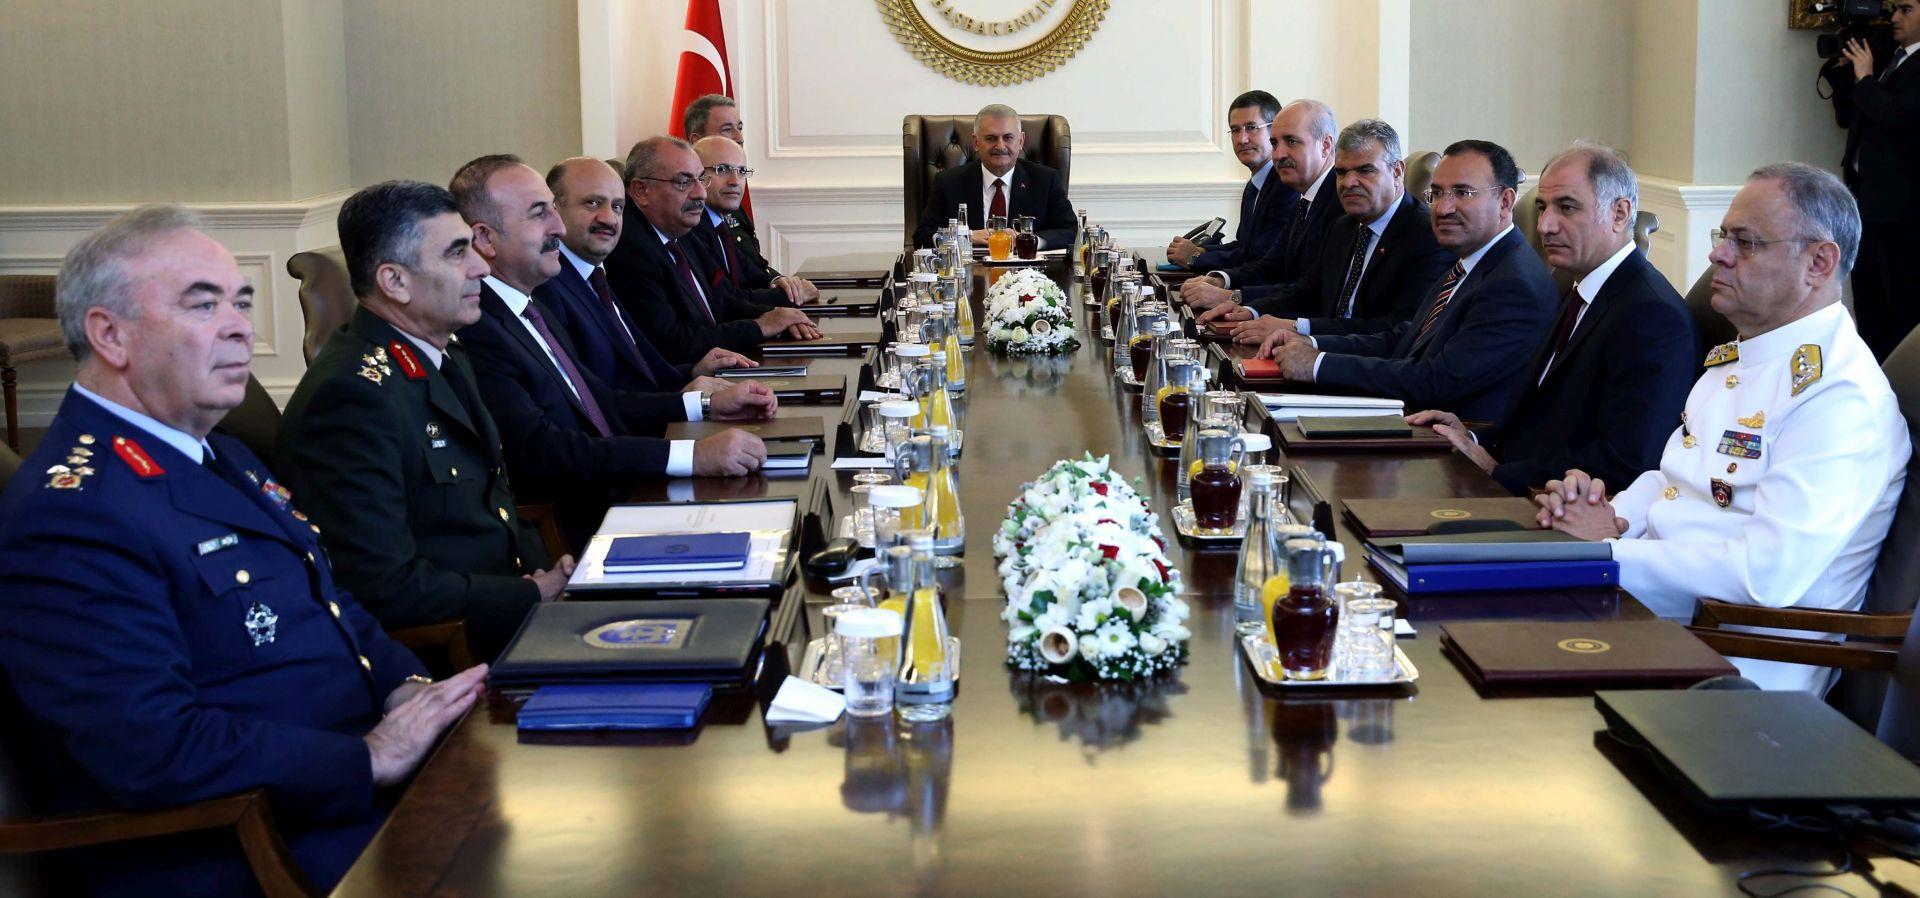 NEUSPJELI PUČ: Turska izdala uhidbene naloge za 243 pripadnika vojske